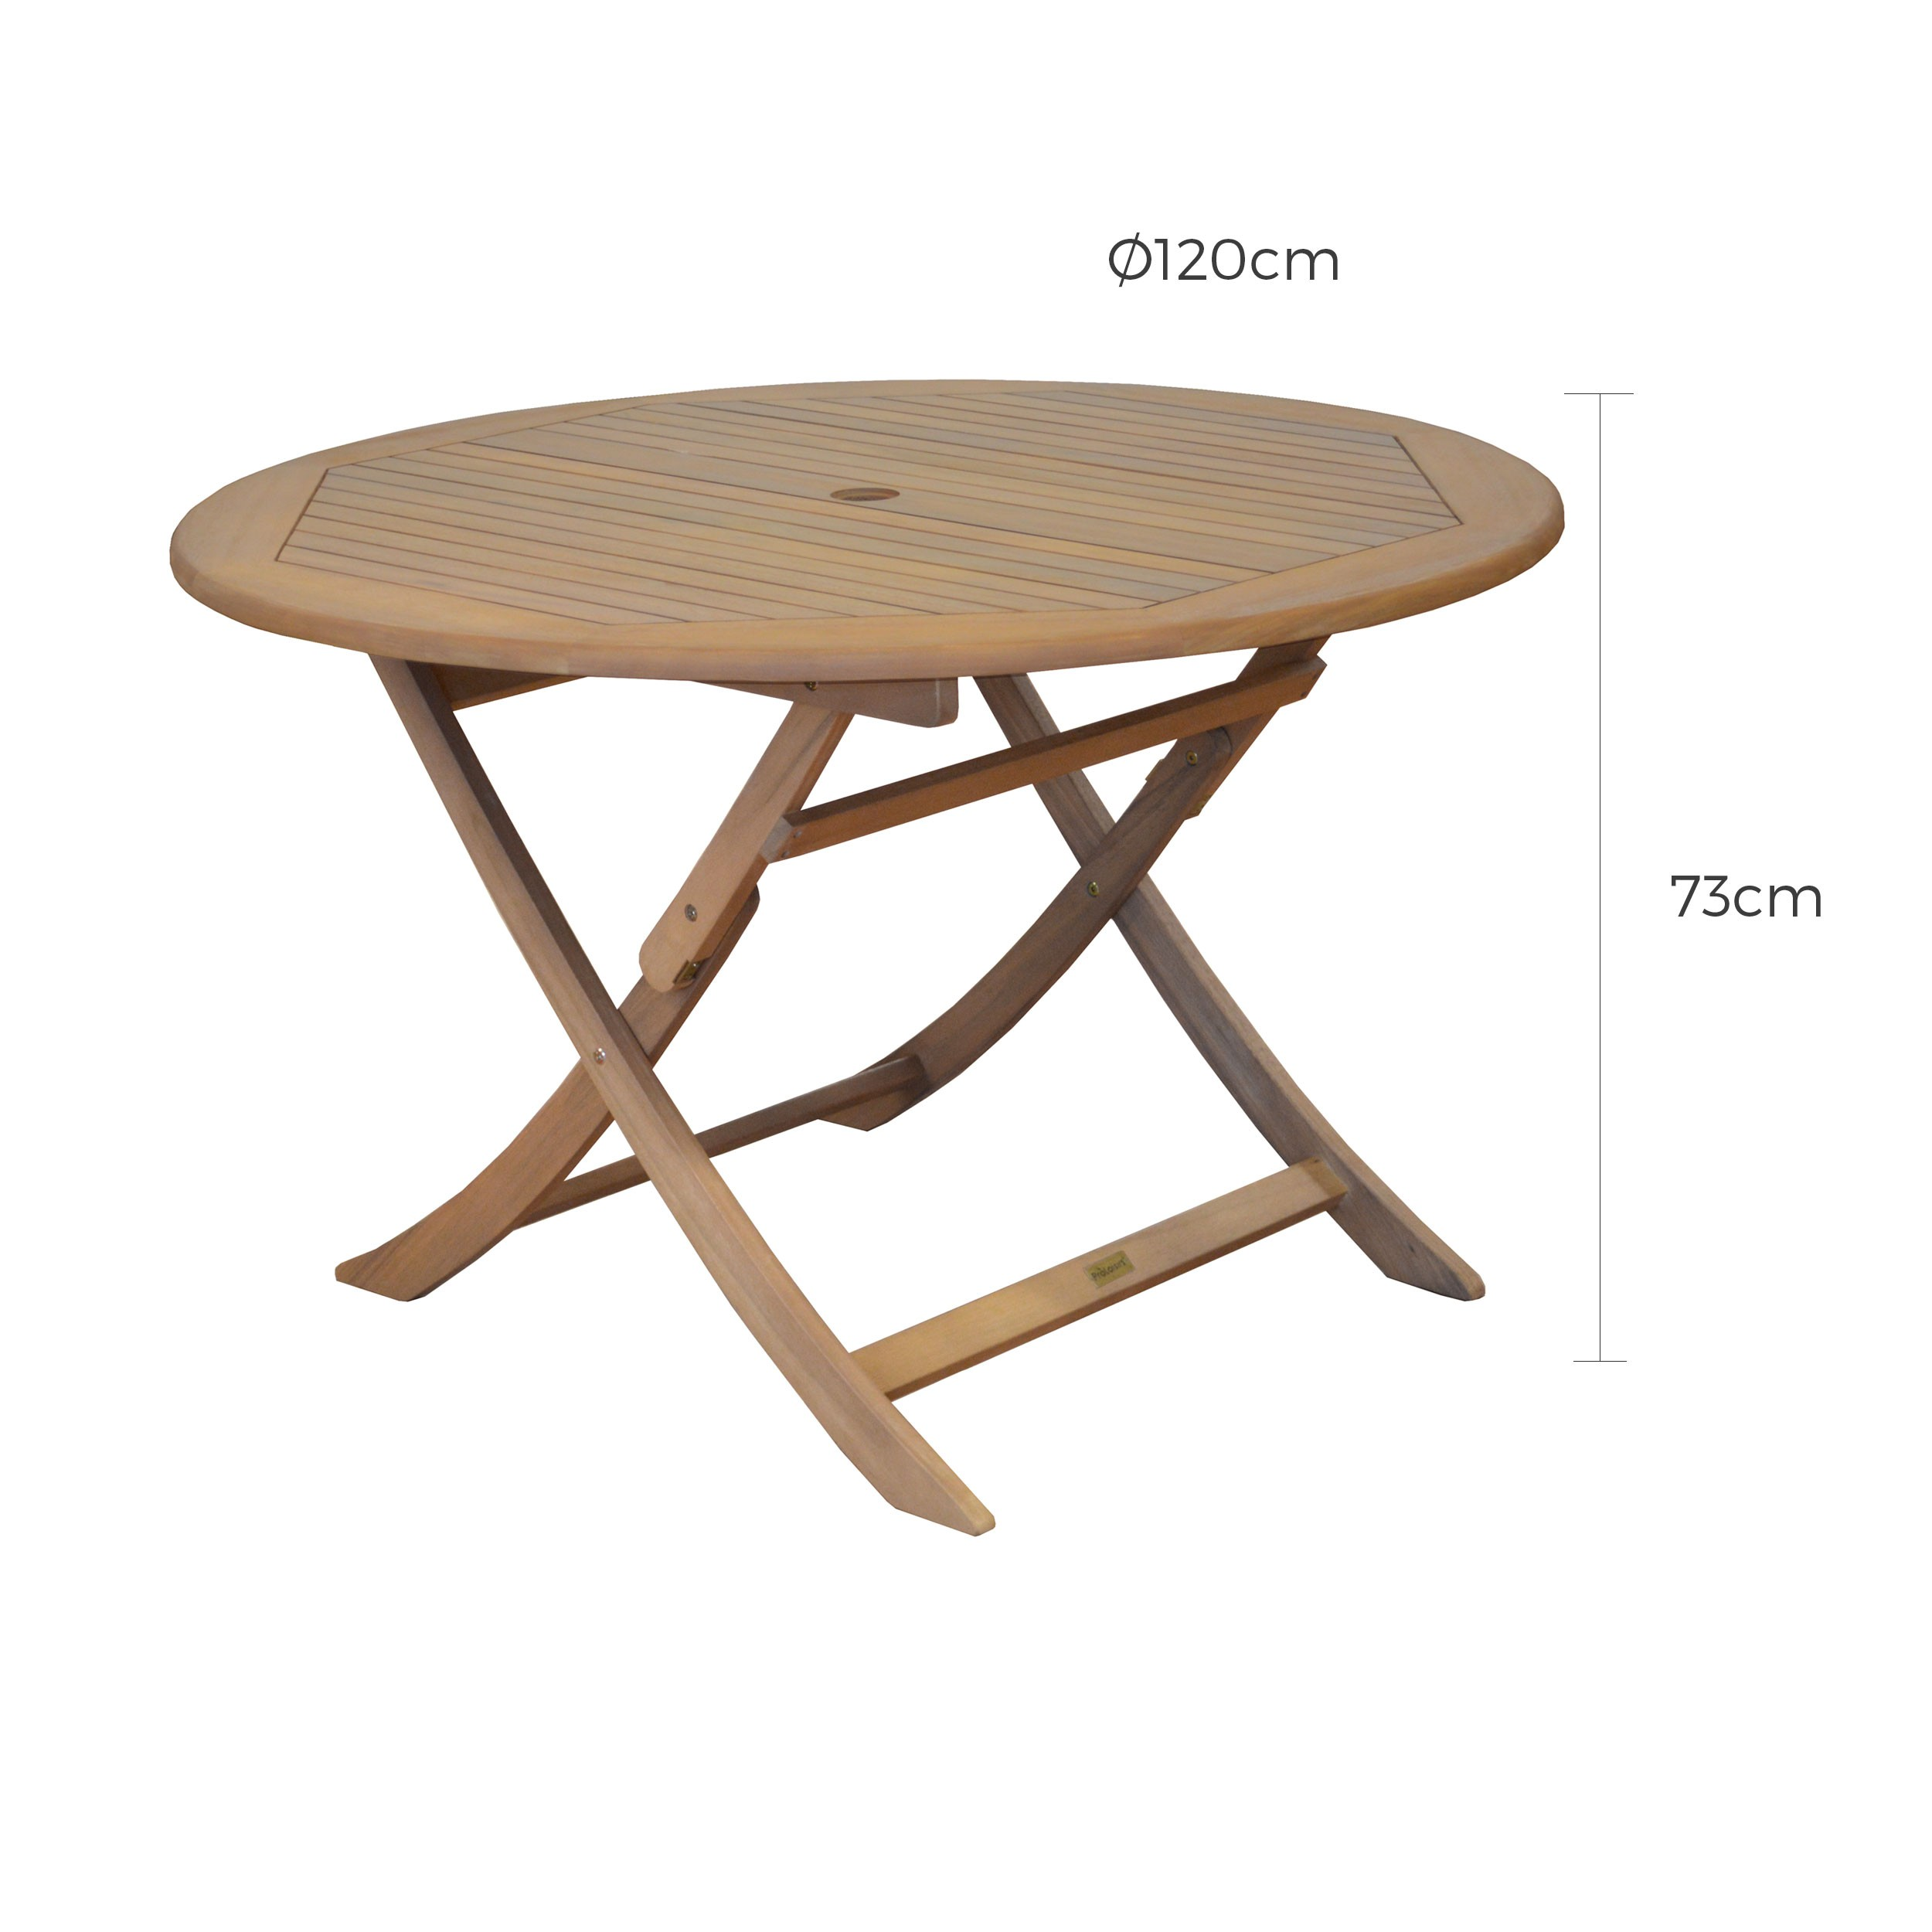 acheter table de jardin bois acheter table ronde previous - Table De Jardin Ronde